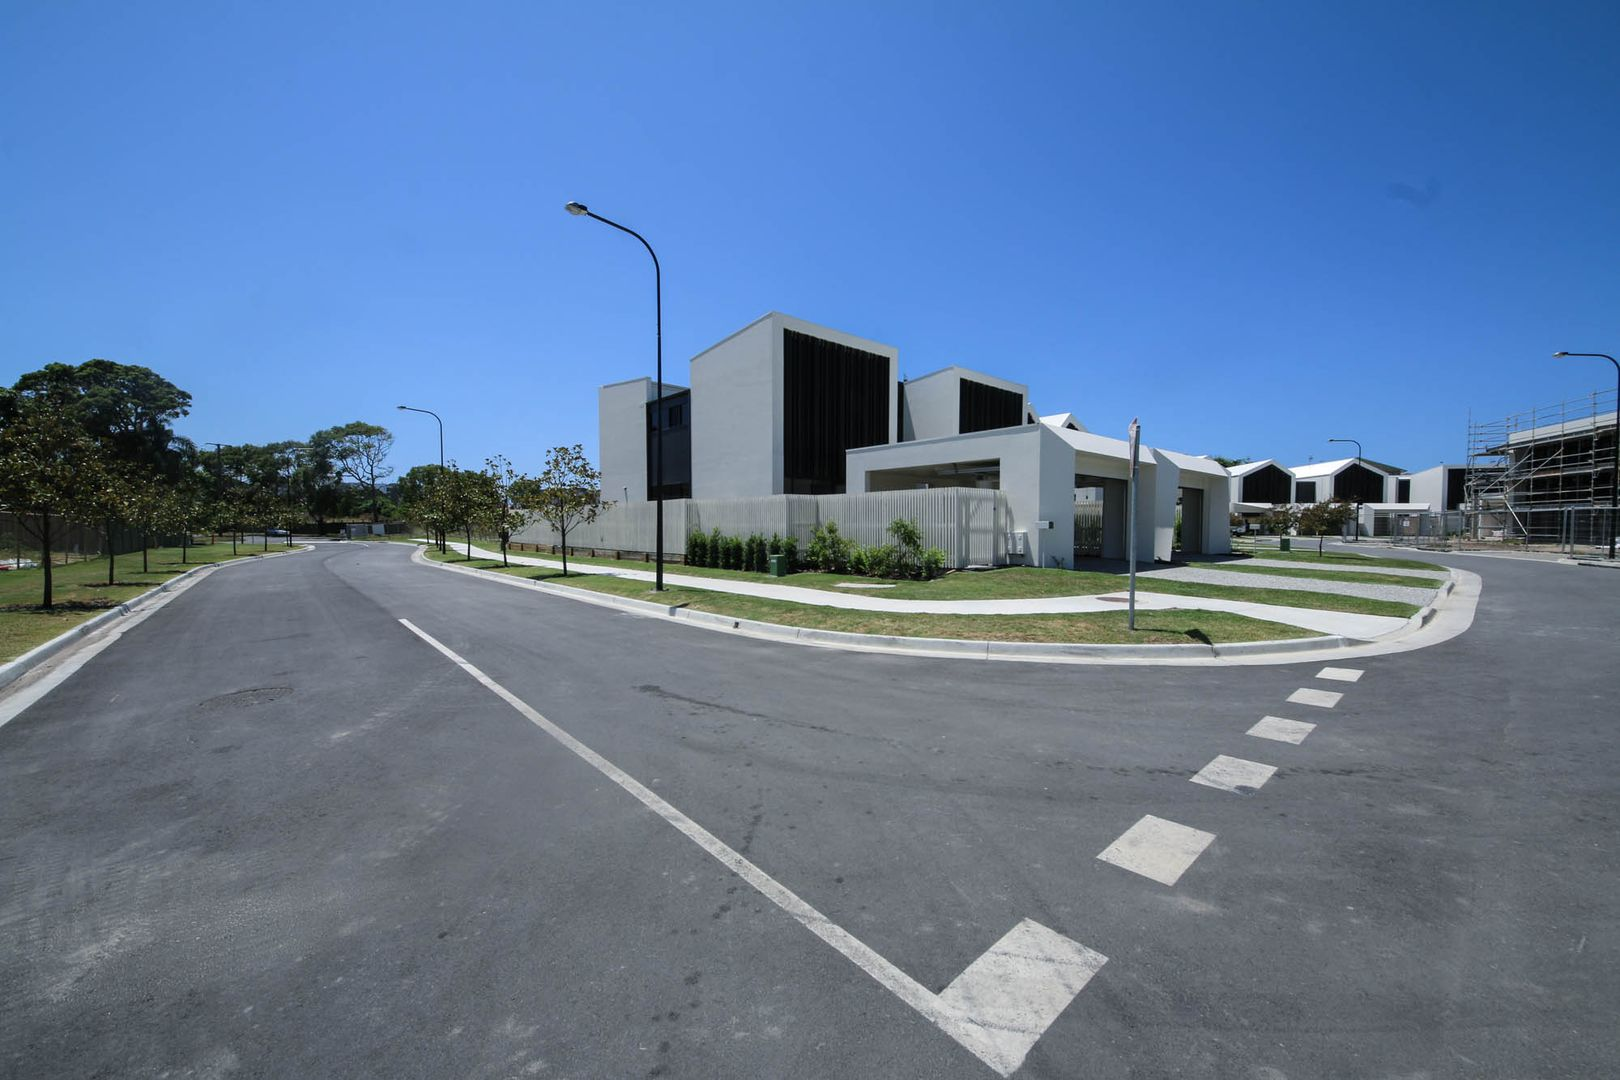 1/43 Magnoli Circuit, Palm Beach QLD 4221, Image 1